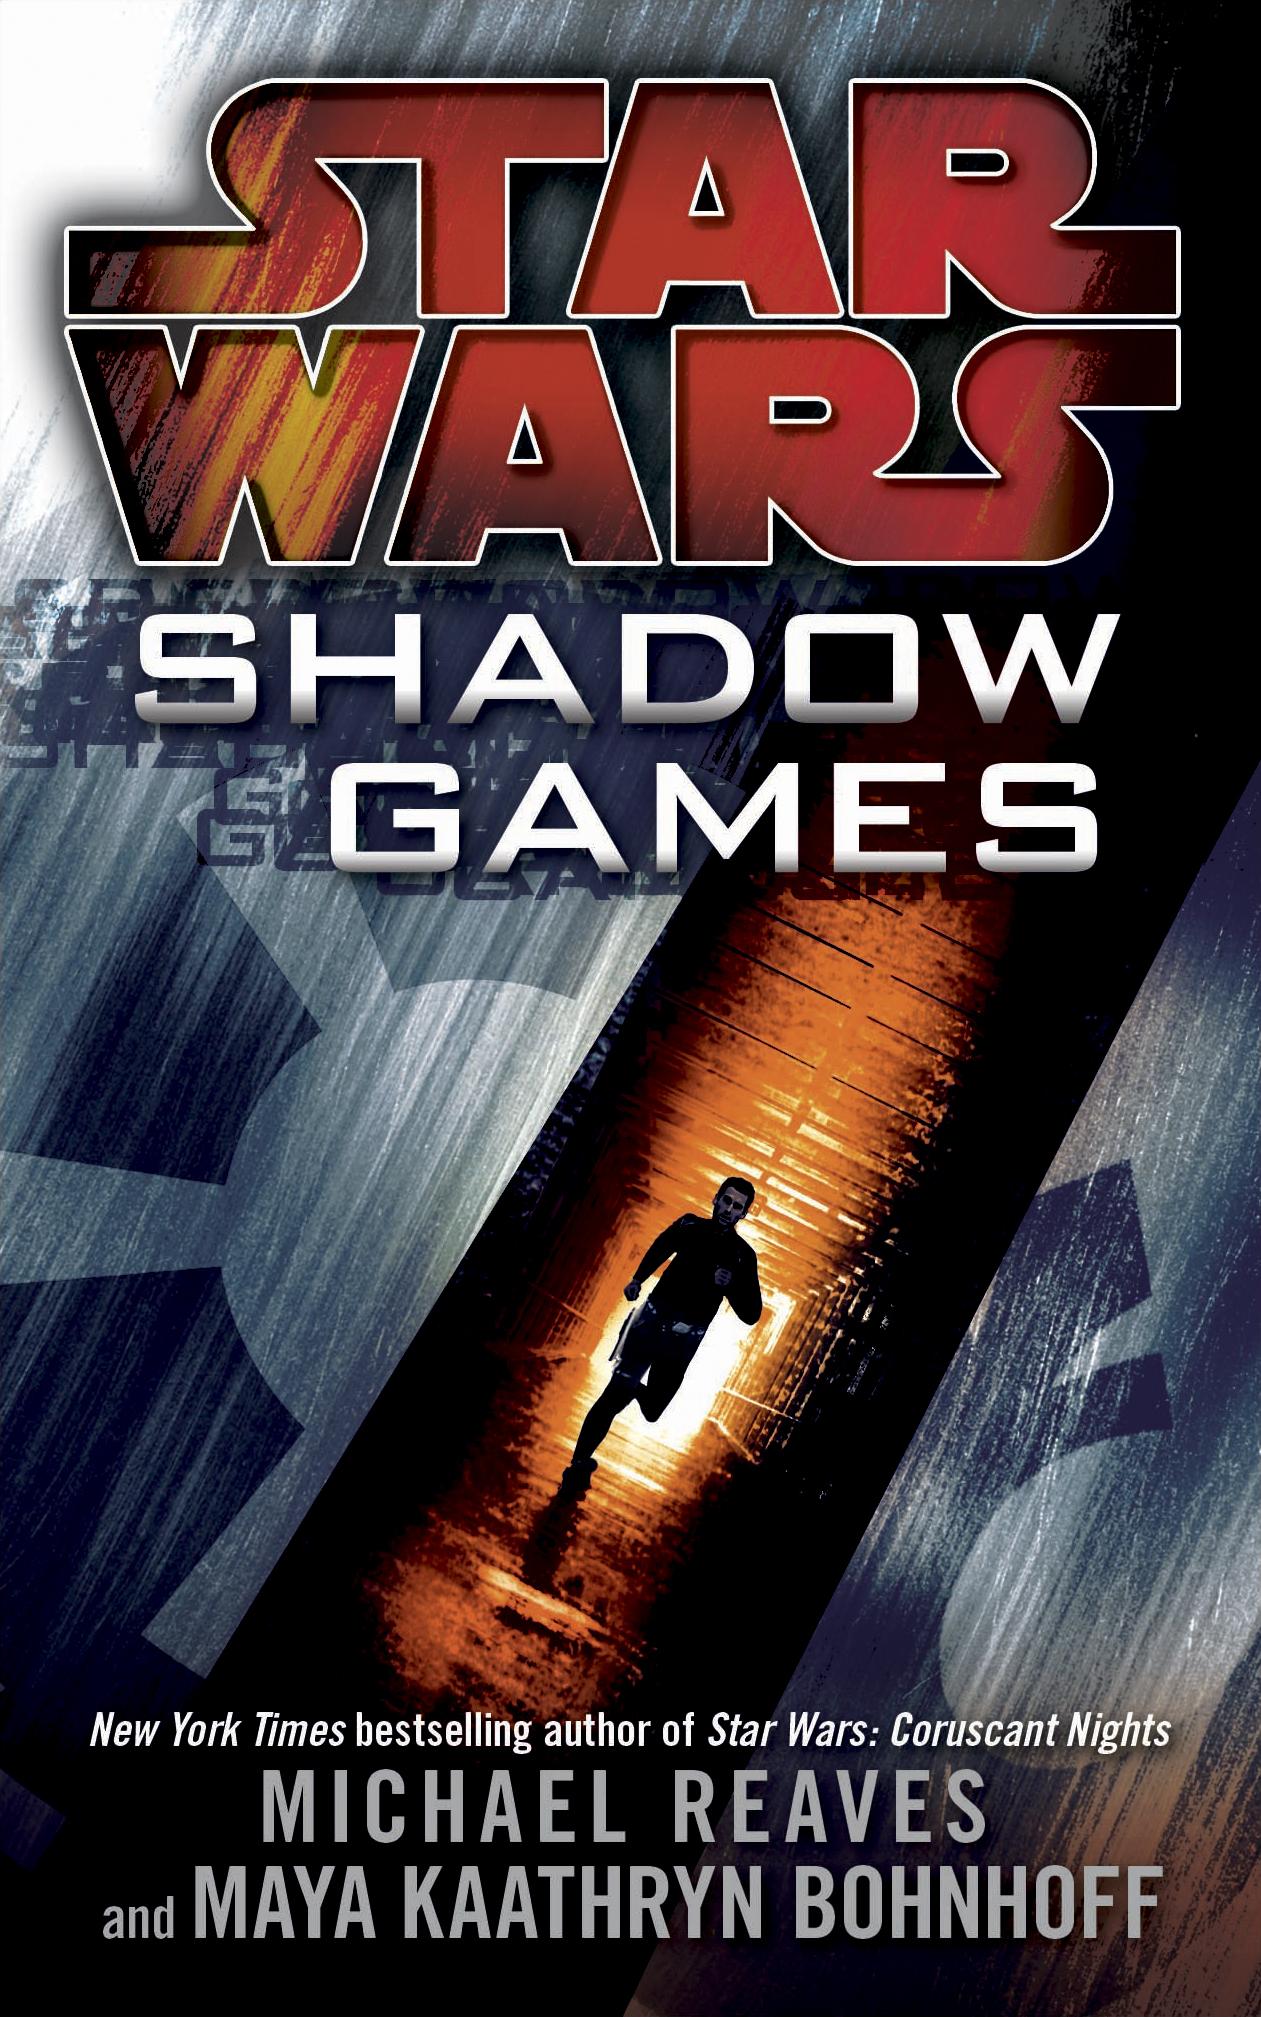 Star Wars Shadow Games